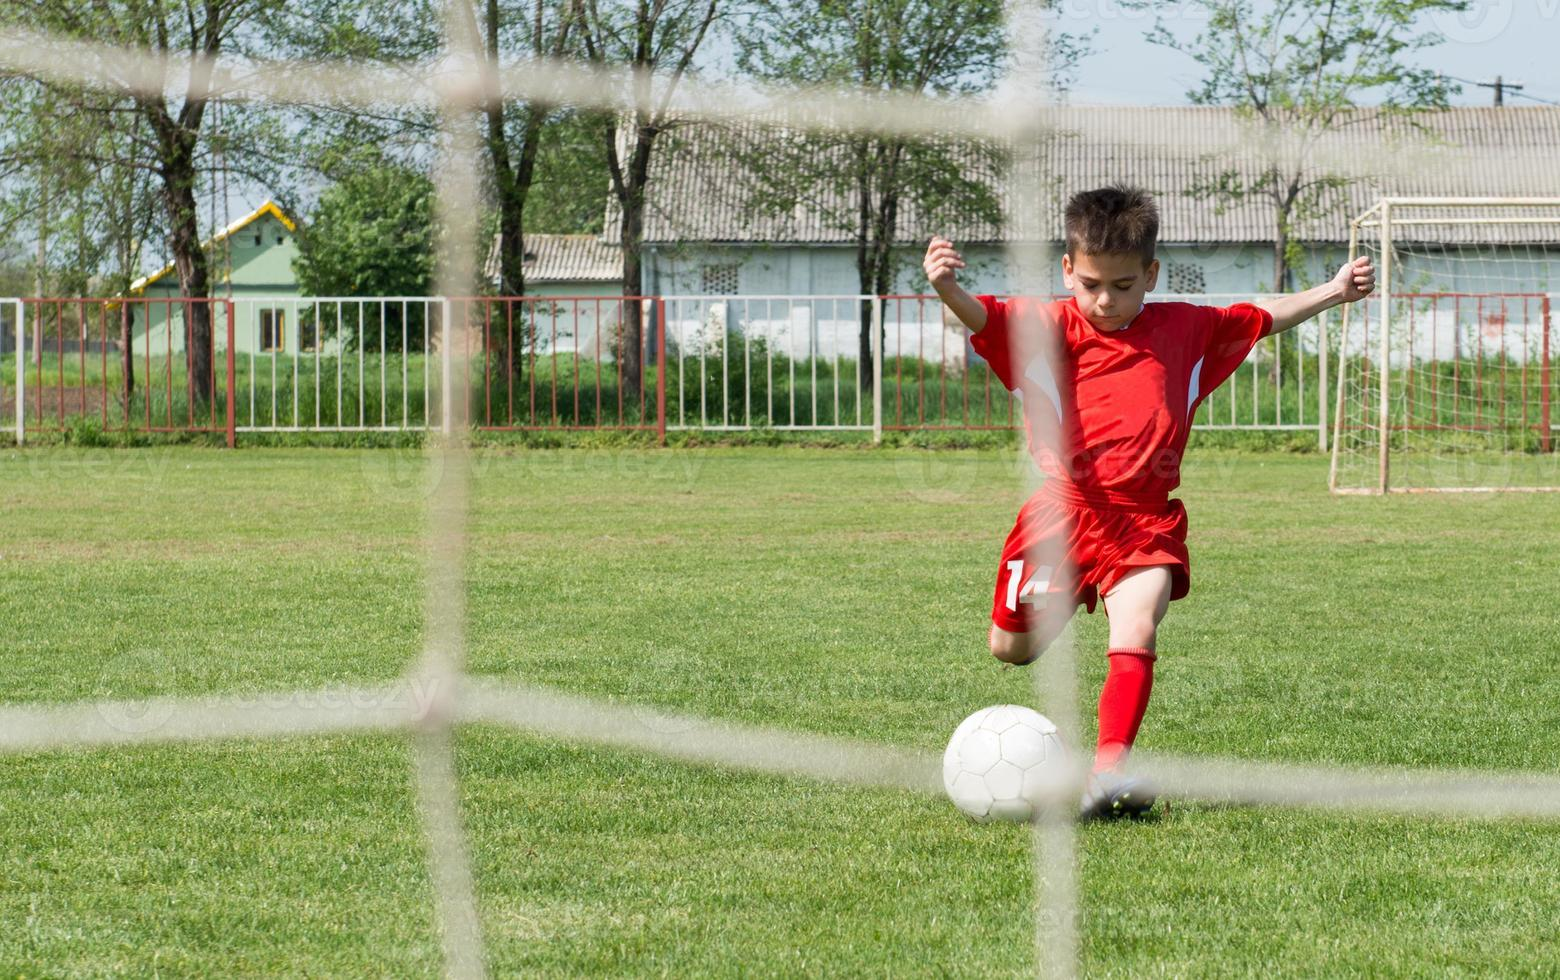 Shooting at Goal photo